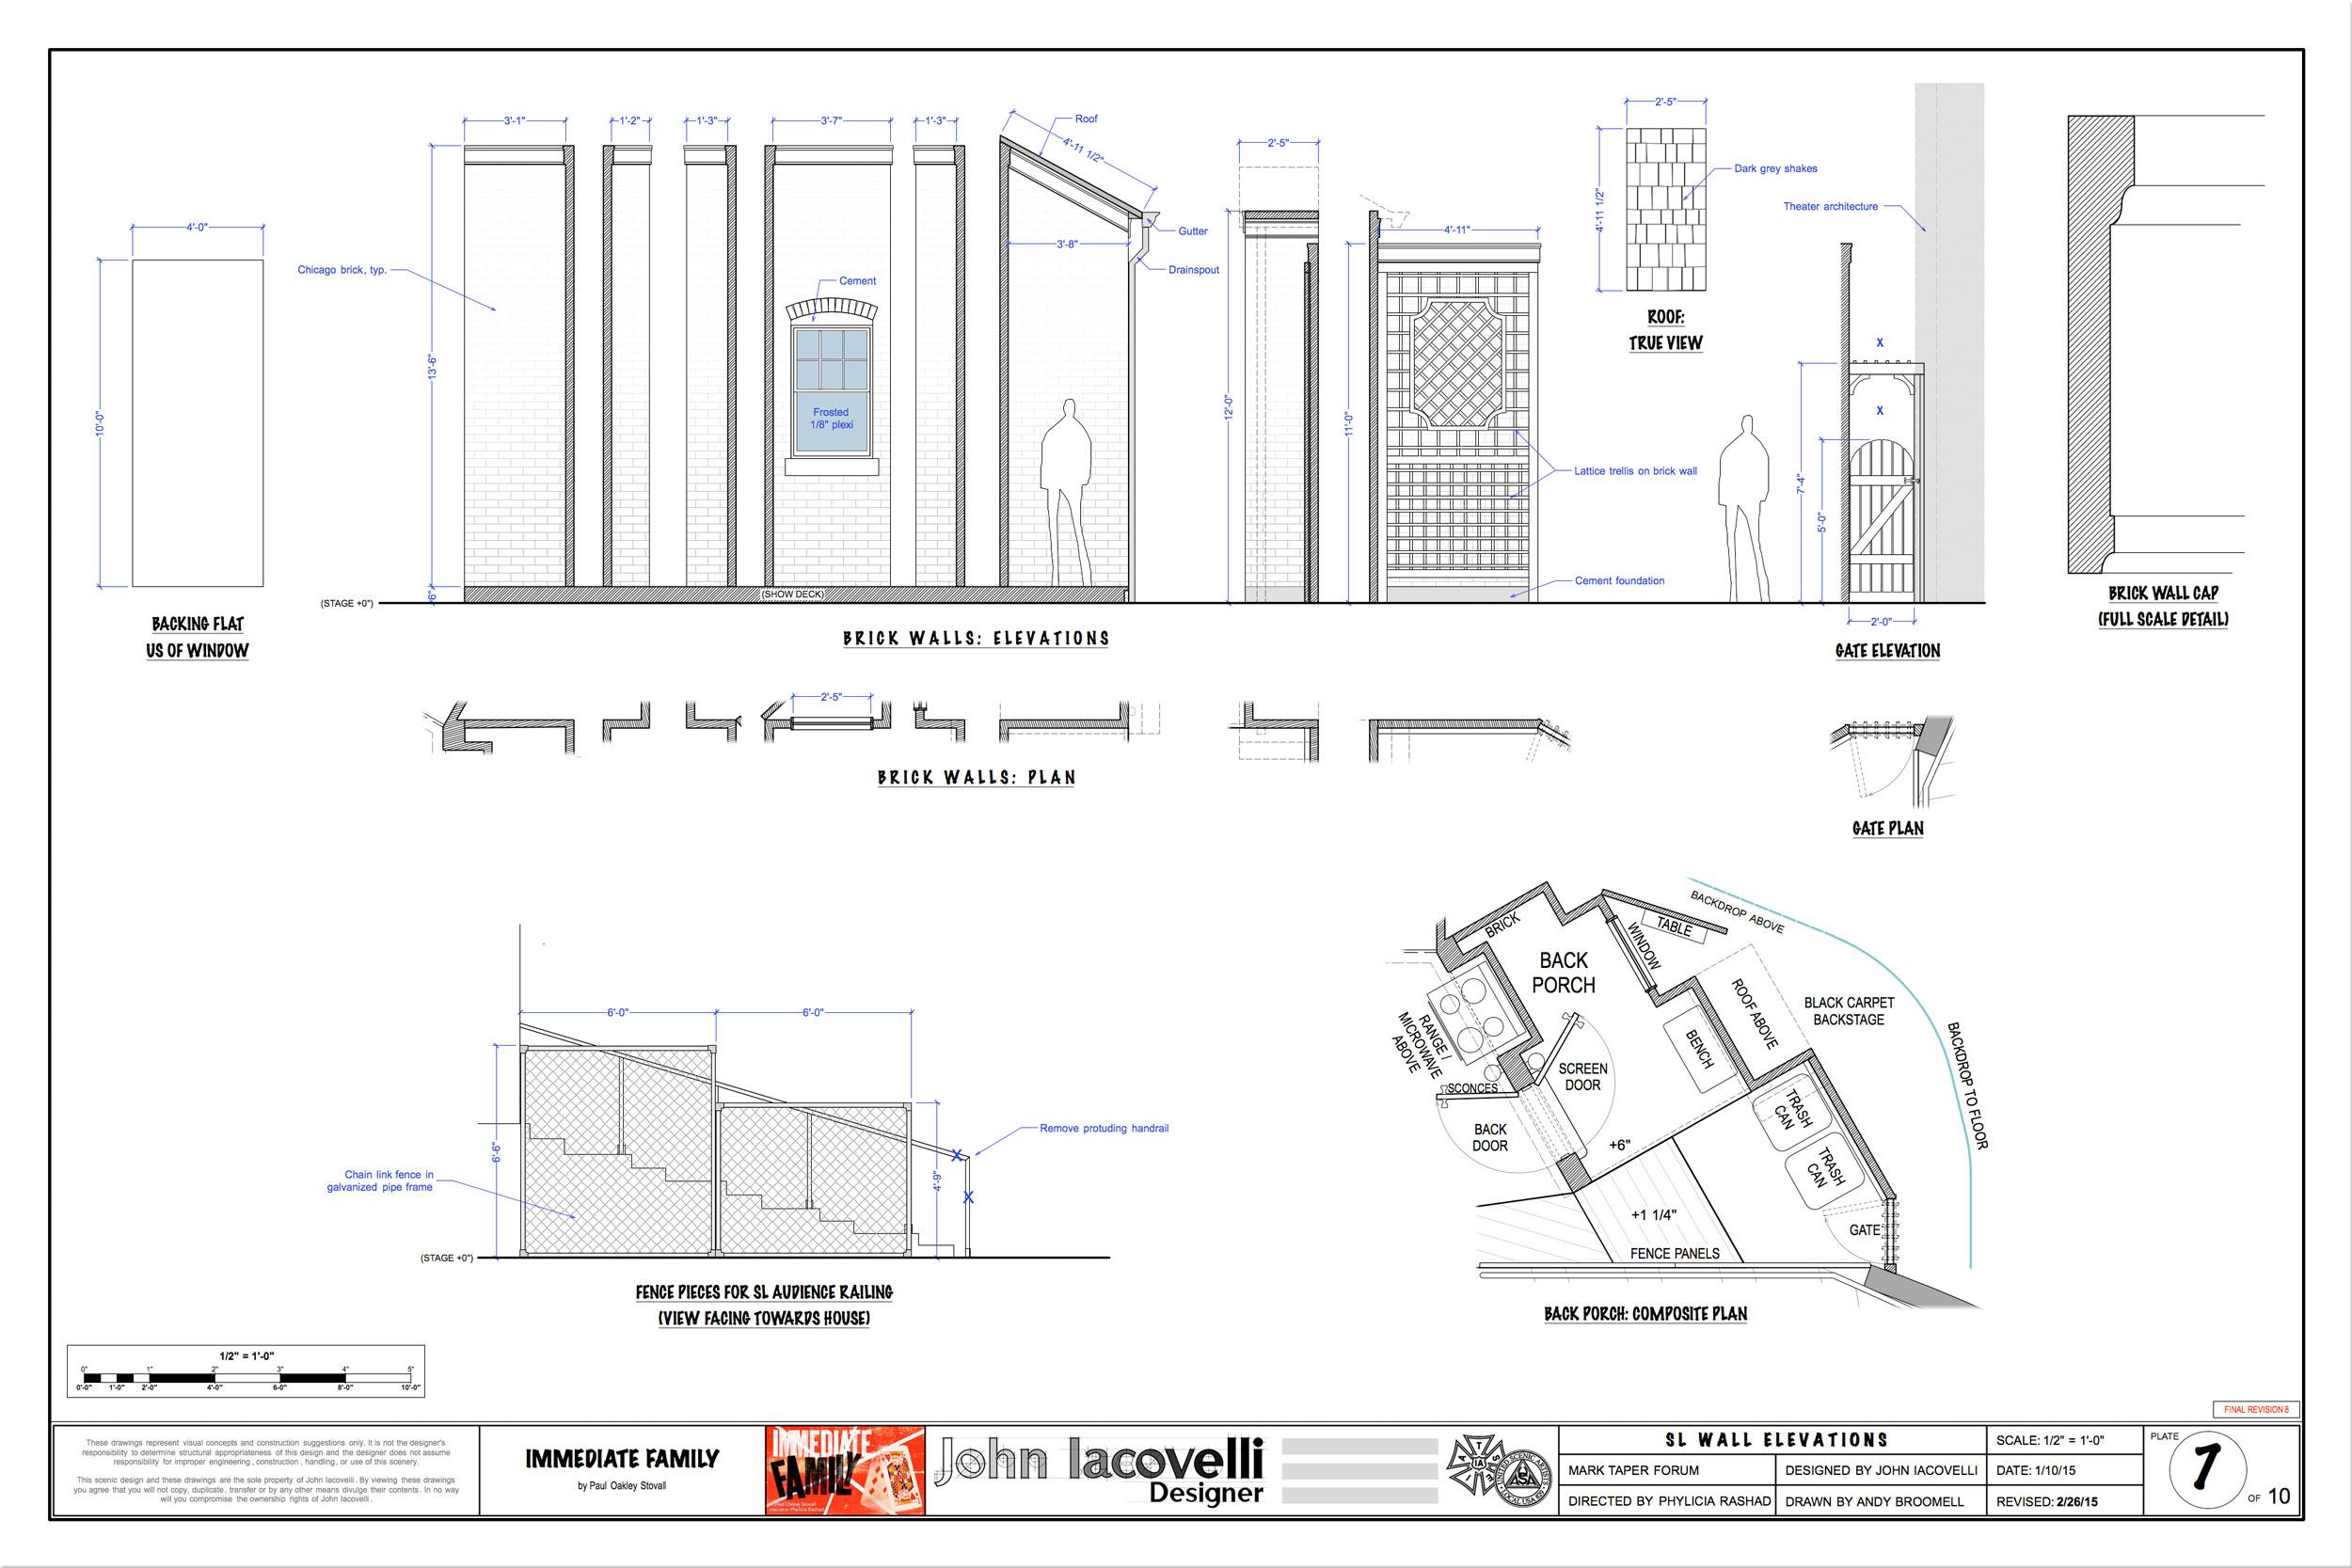 andy-broomell-scenic-design-drafting-immediate-family-7-vectorworks.jpg